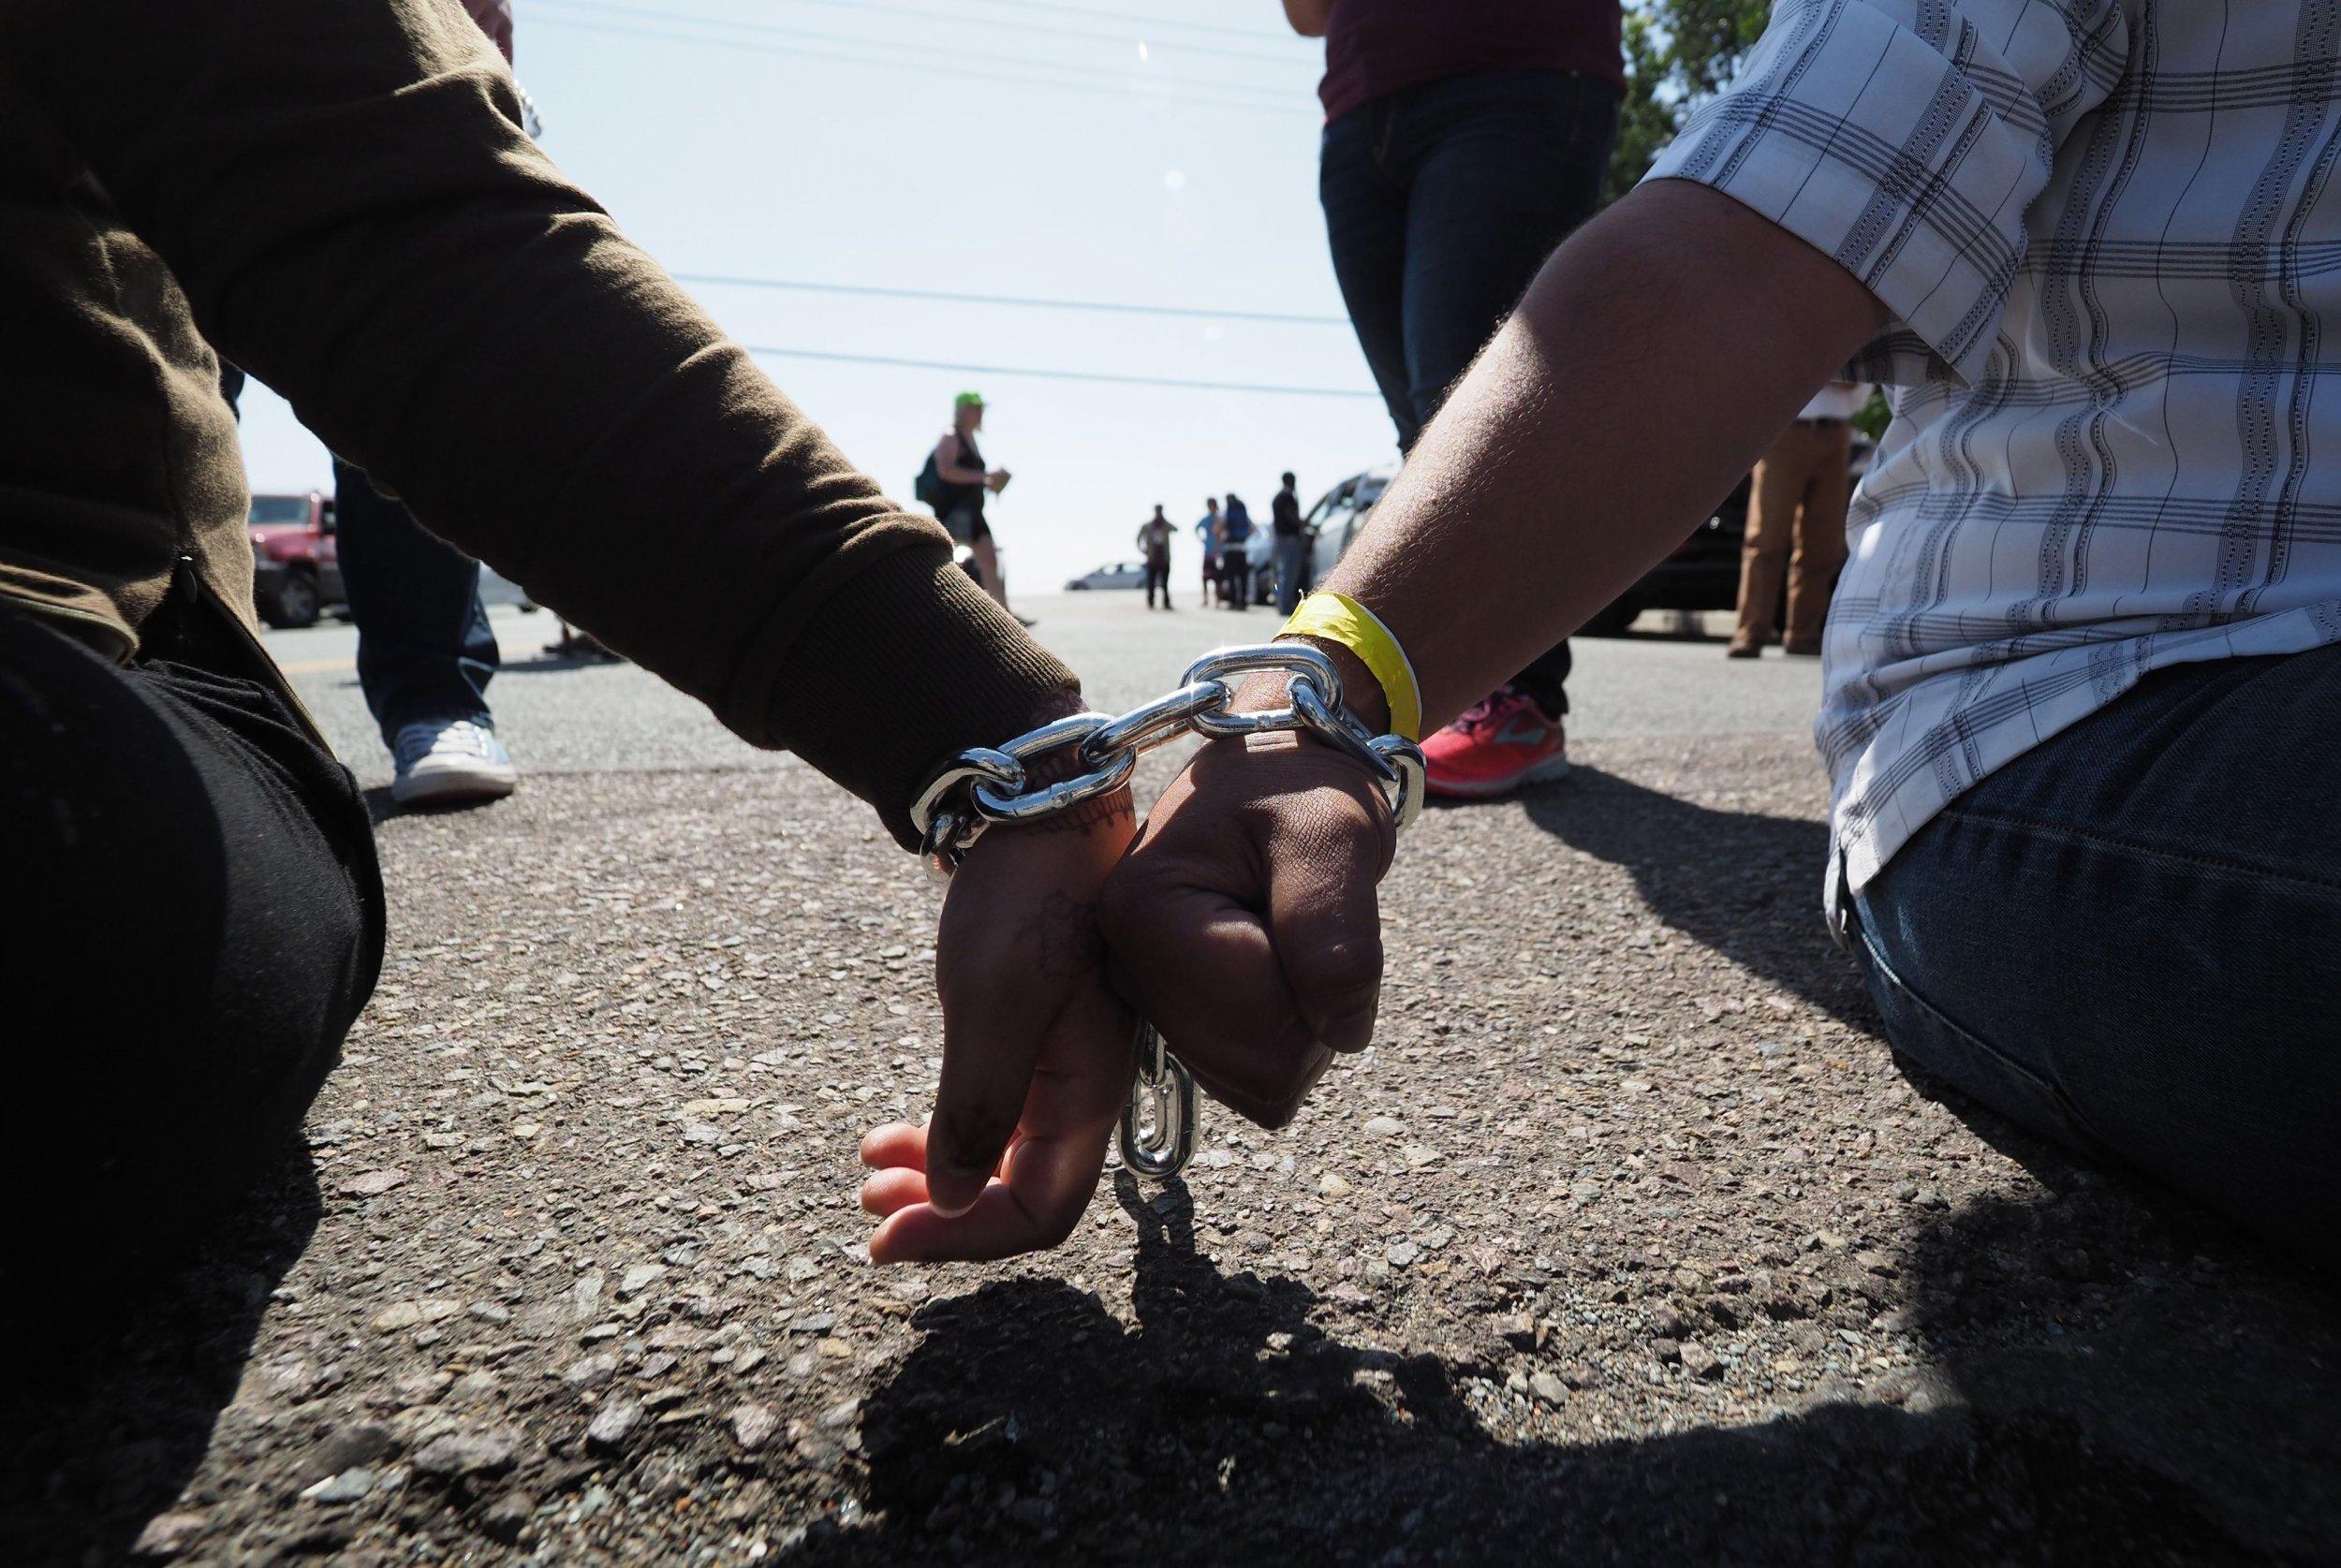 Detention Center protest